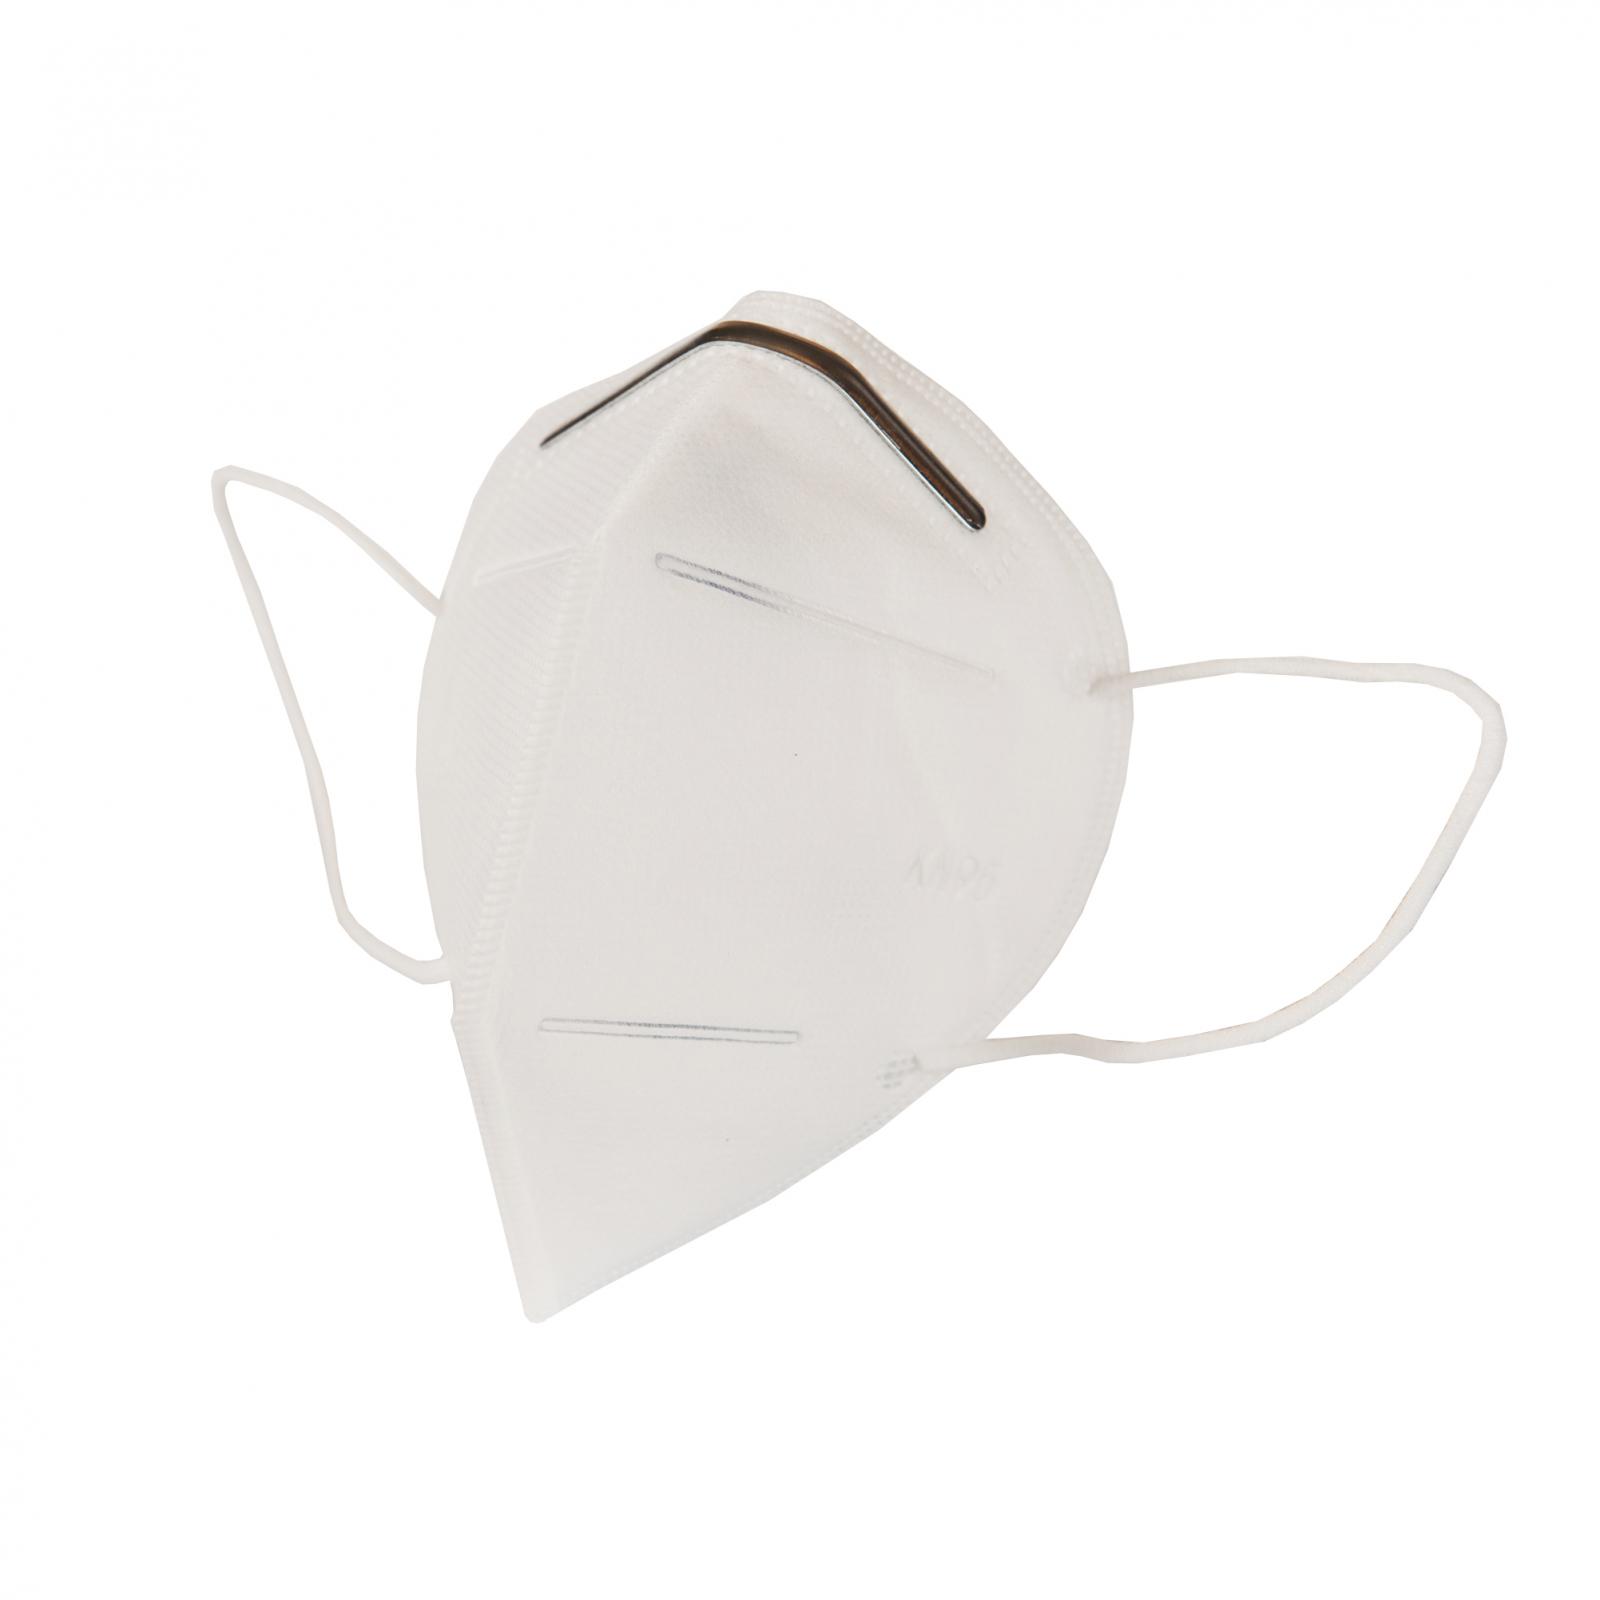 Set 10 bucati masca medicala KN95 4 straturi FFP2 sterile imagine